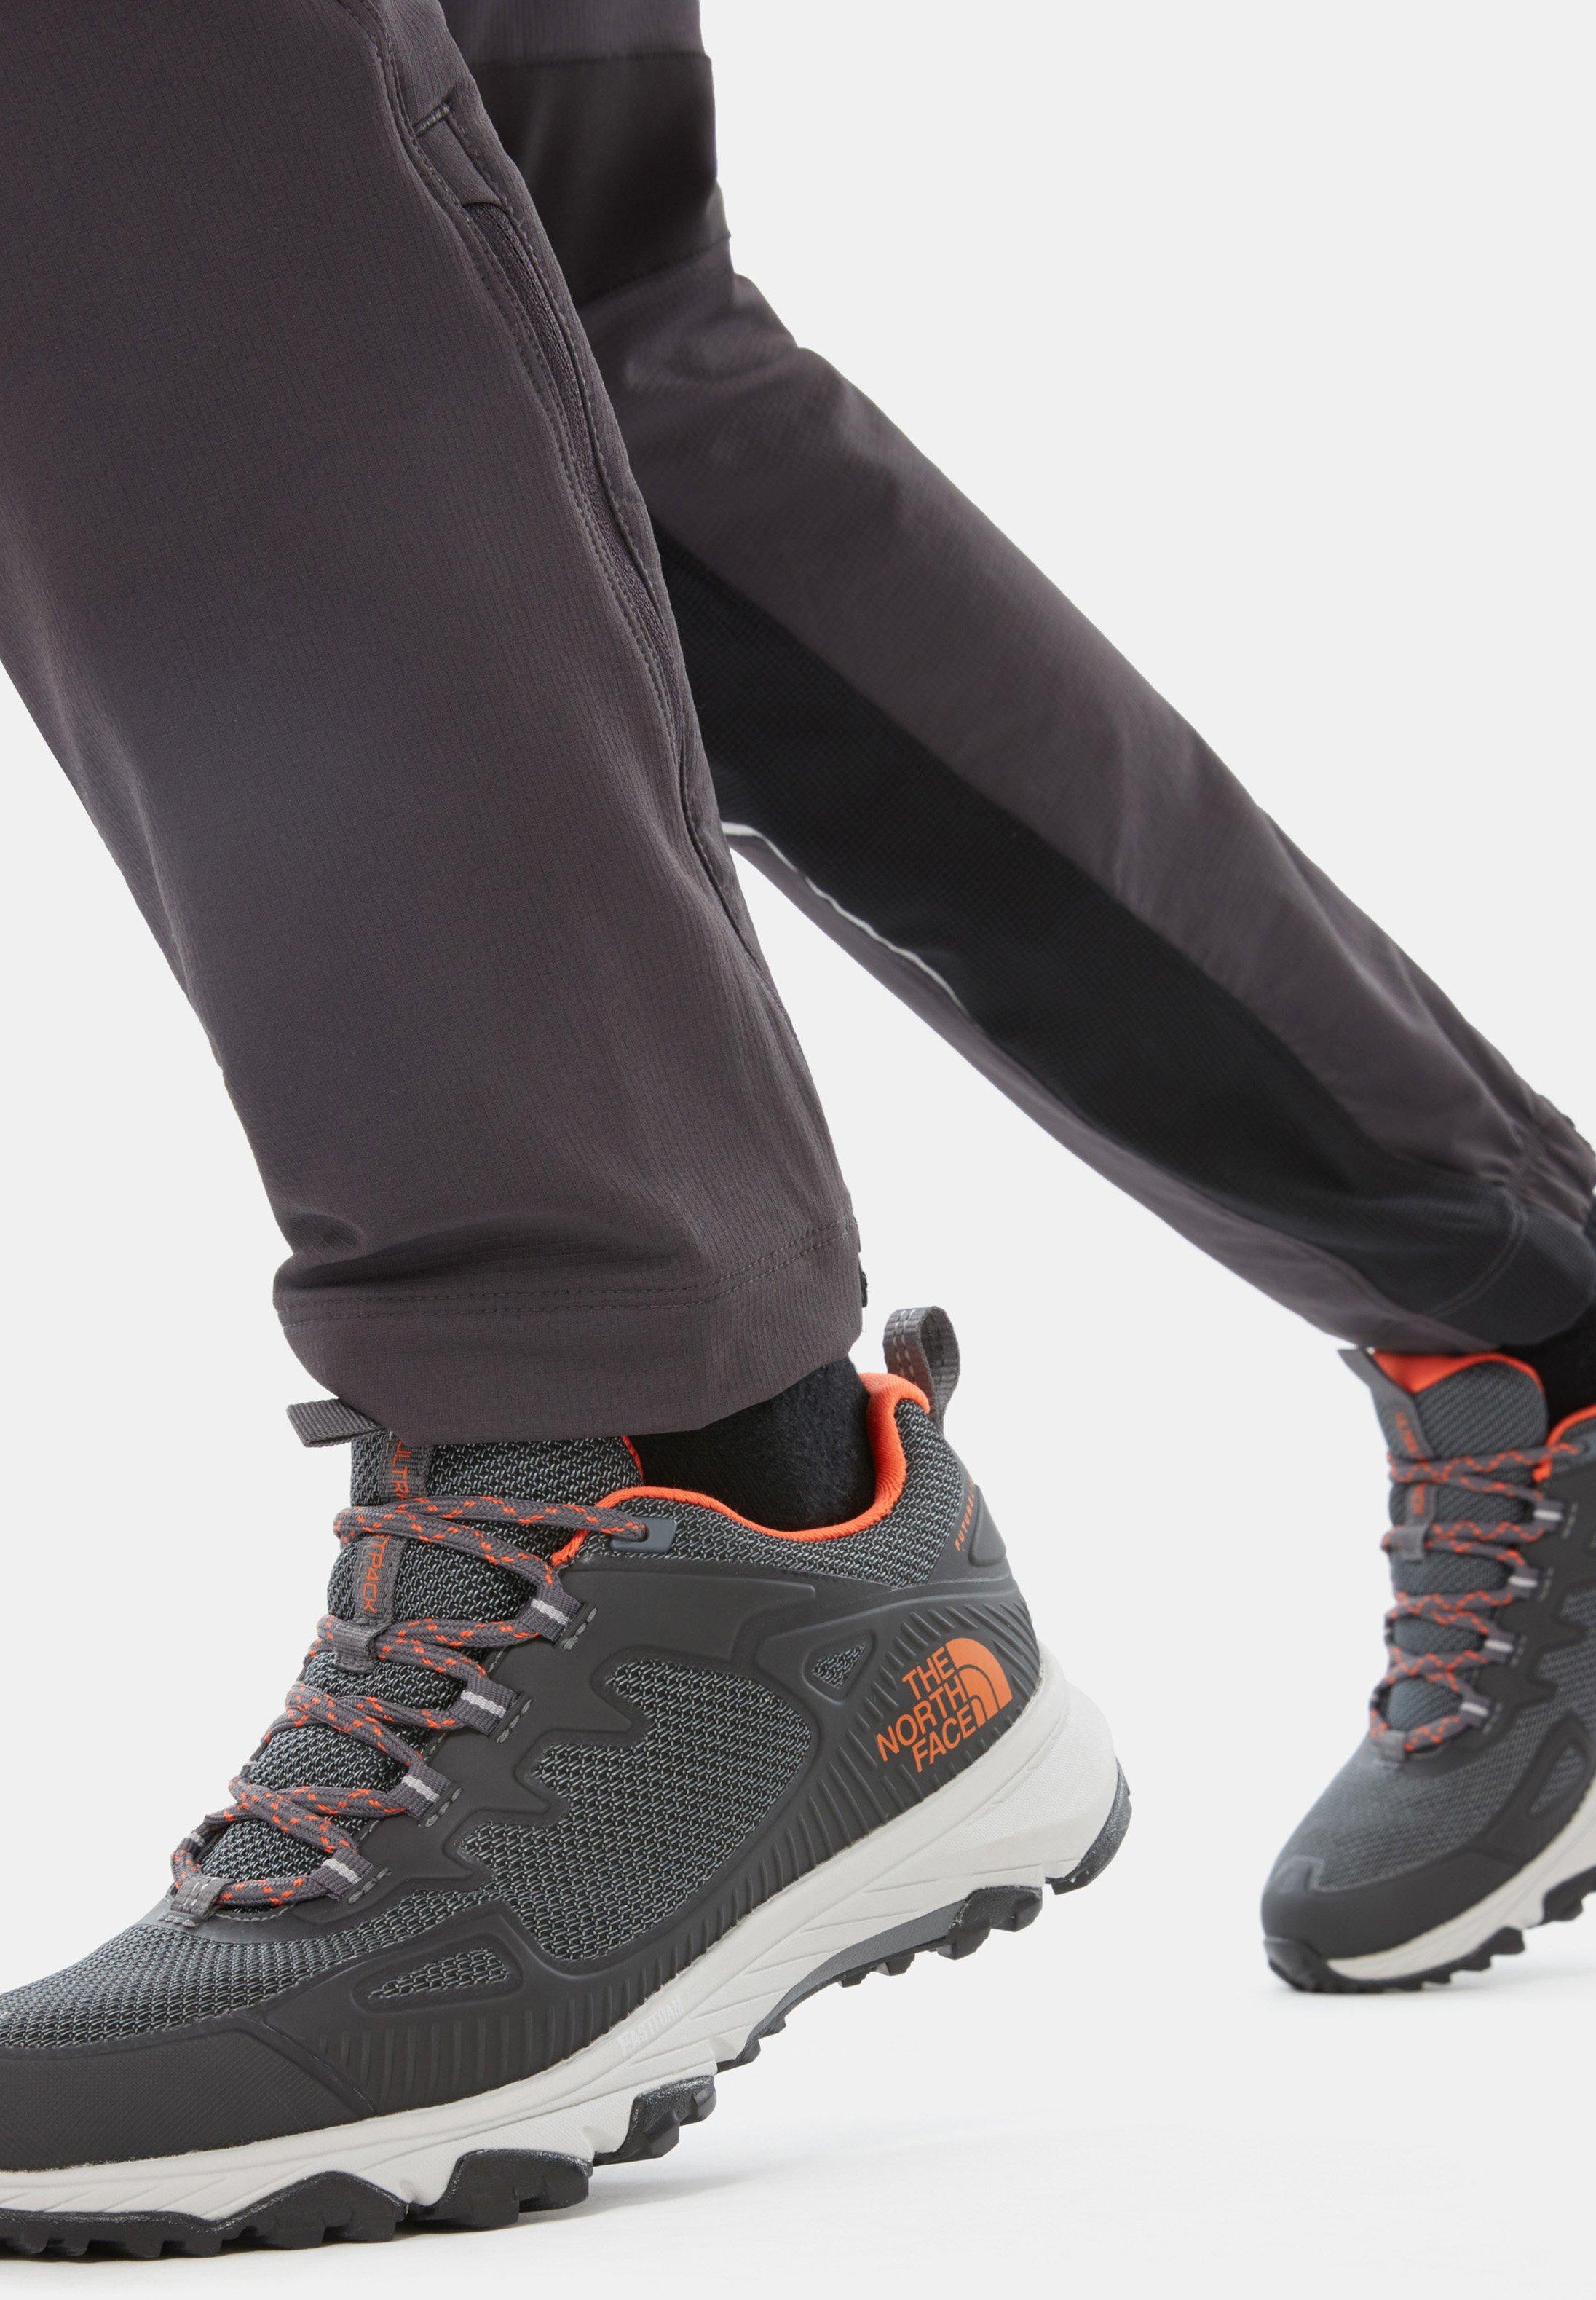 Uomo M ULTRA FASTPACK IV FUTURELIGHT - Scarpa da hiking